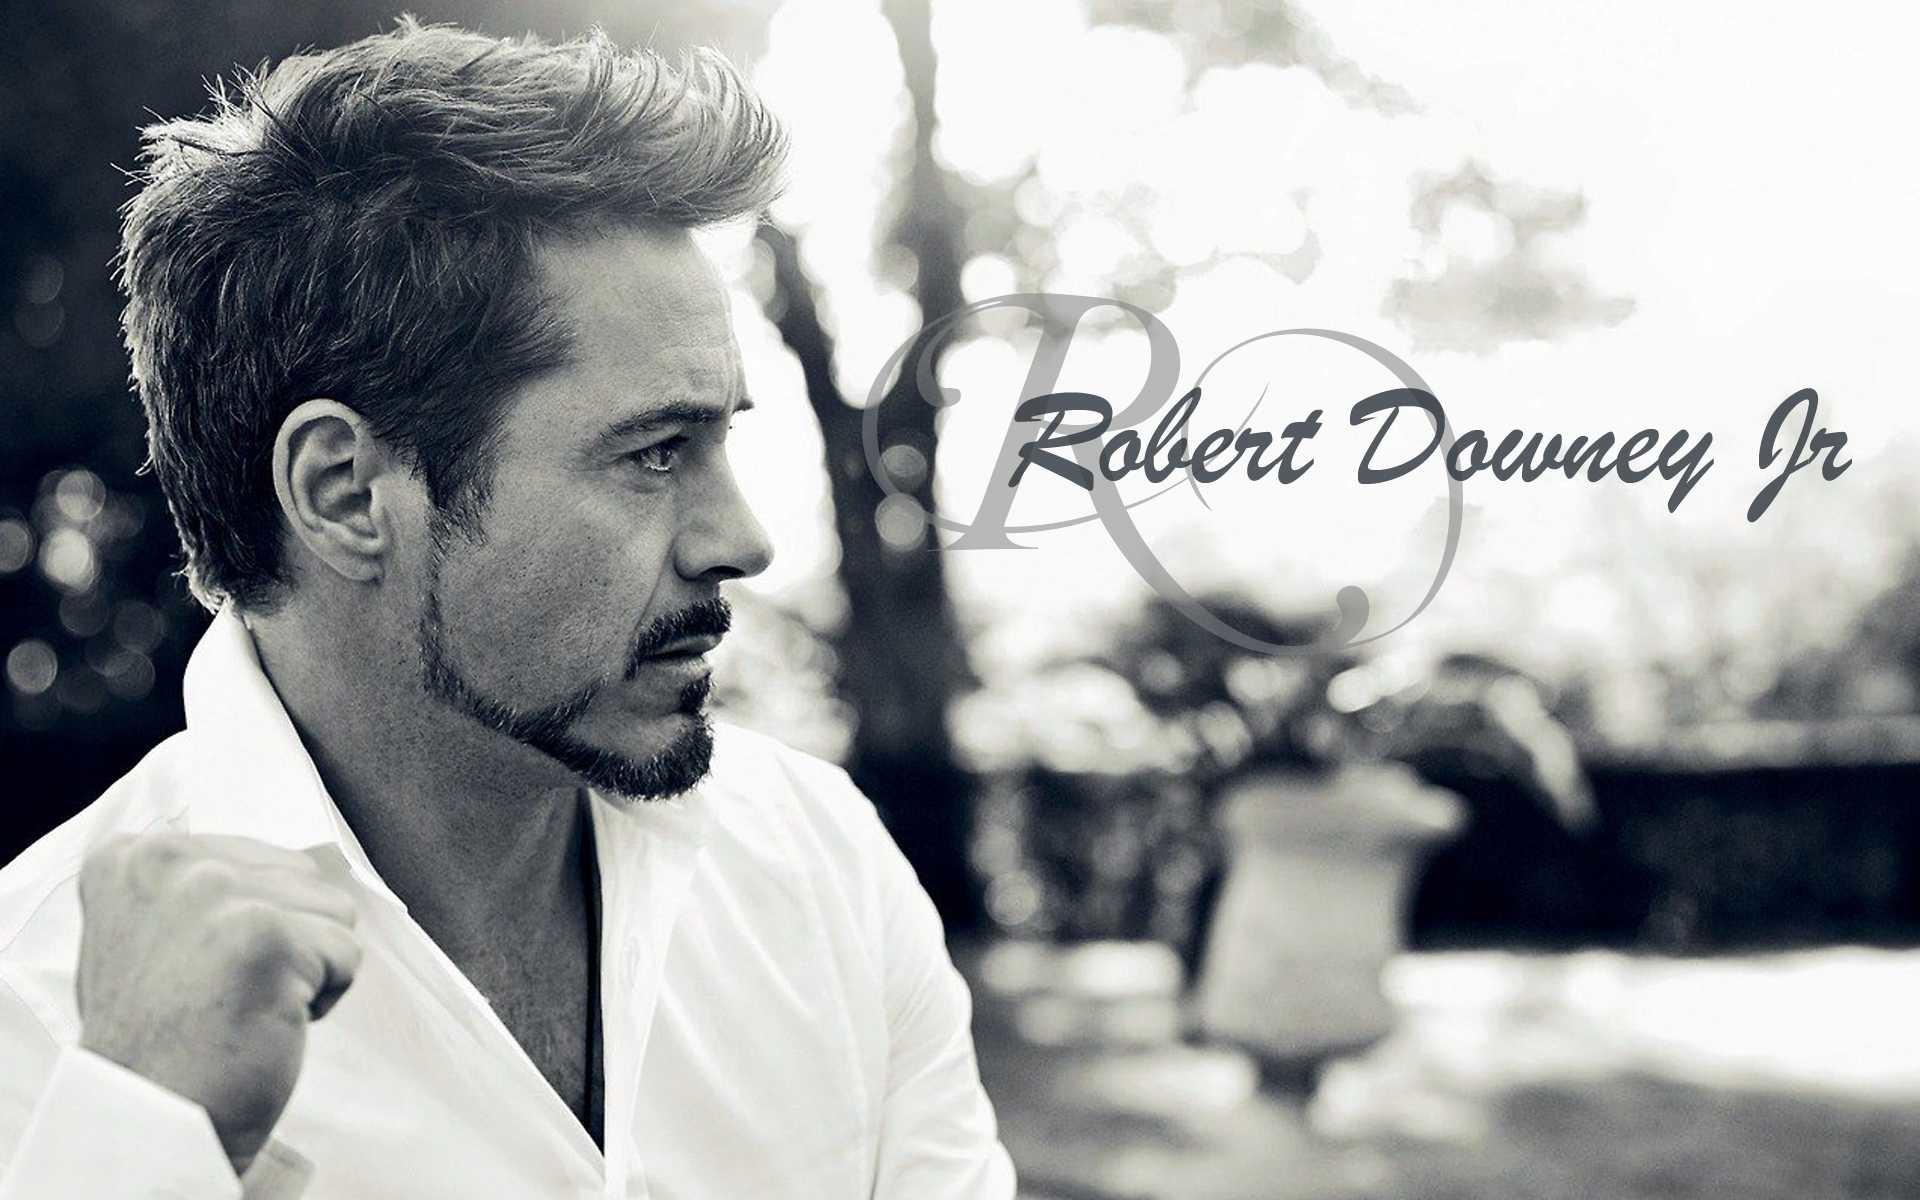 Tony Stark 4k Wallpaper: Robert Downey Jr Iron Man Wallpaper (71+ Images